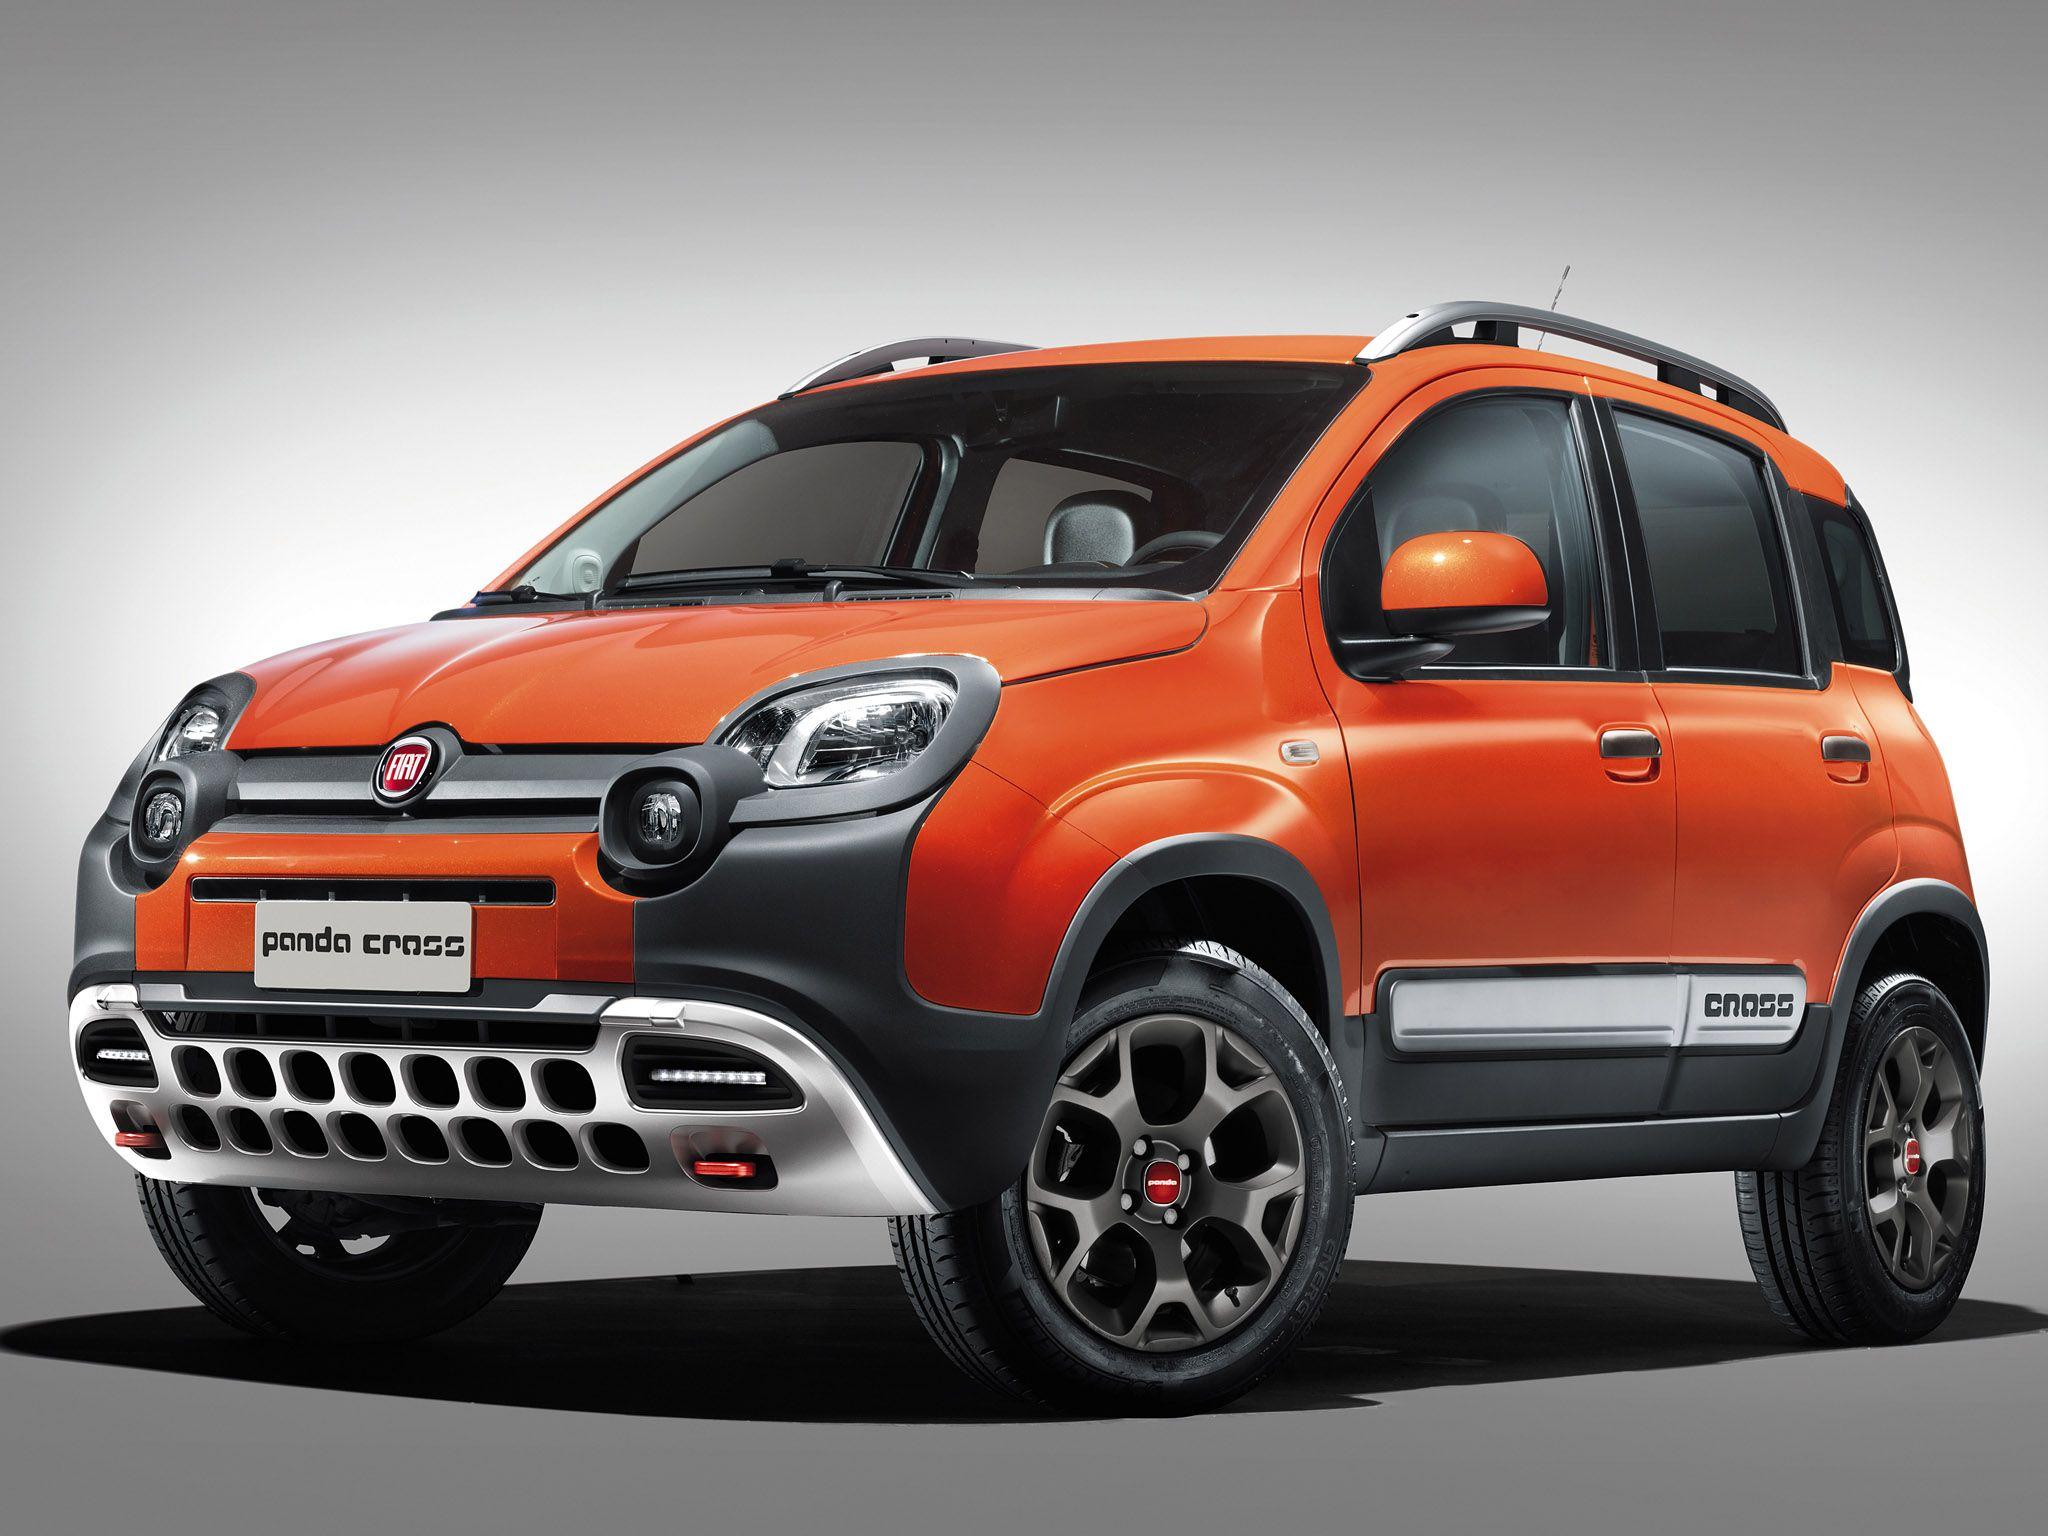 Fiat Panda Cross 4x4 Salon De Geneve 2014 Fiatpanda Fiat